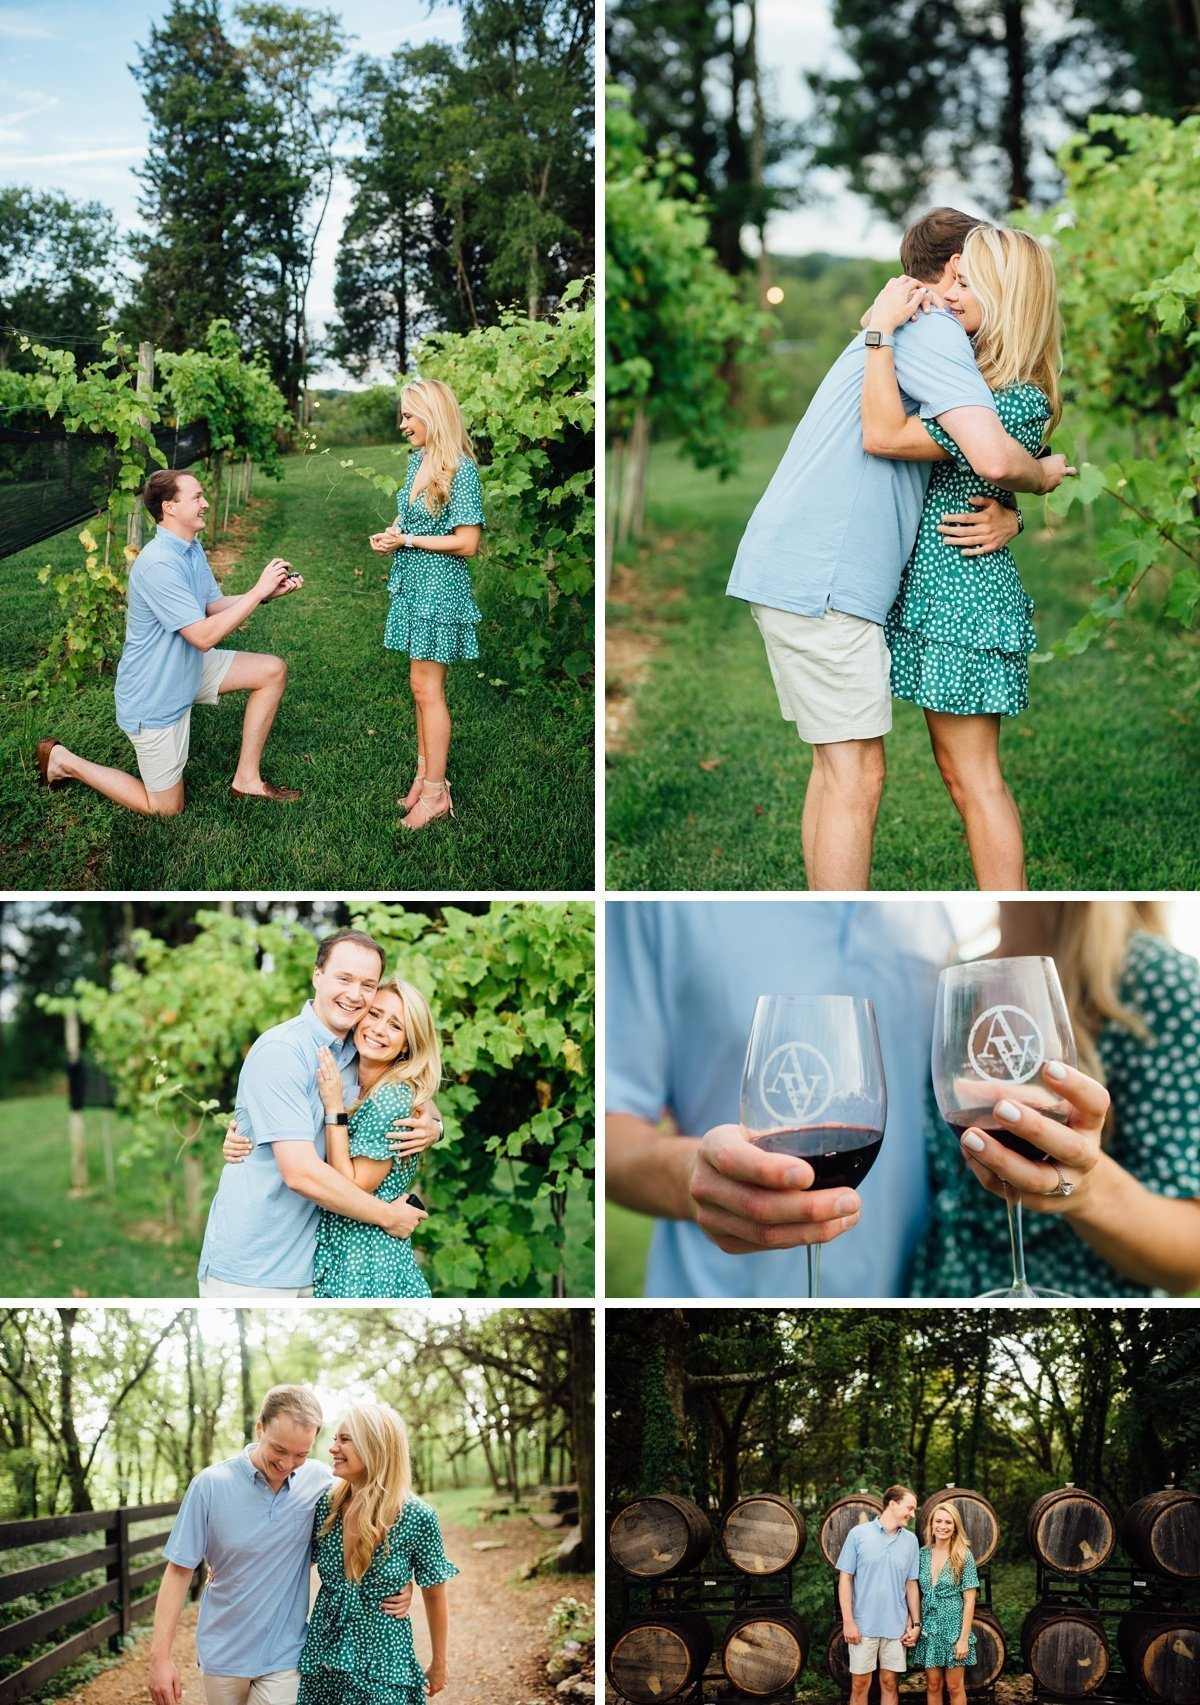 arrington-vineyards-proposal-photographer Nashville Proposal Photographer